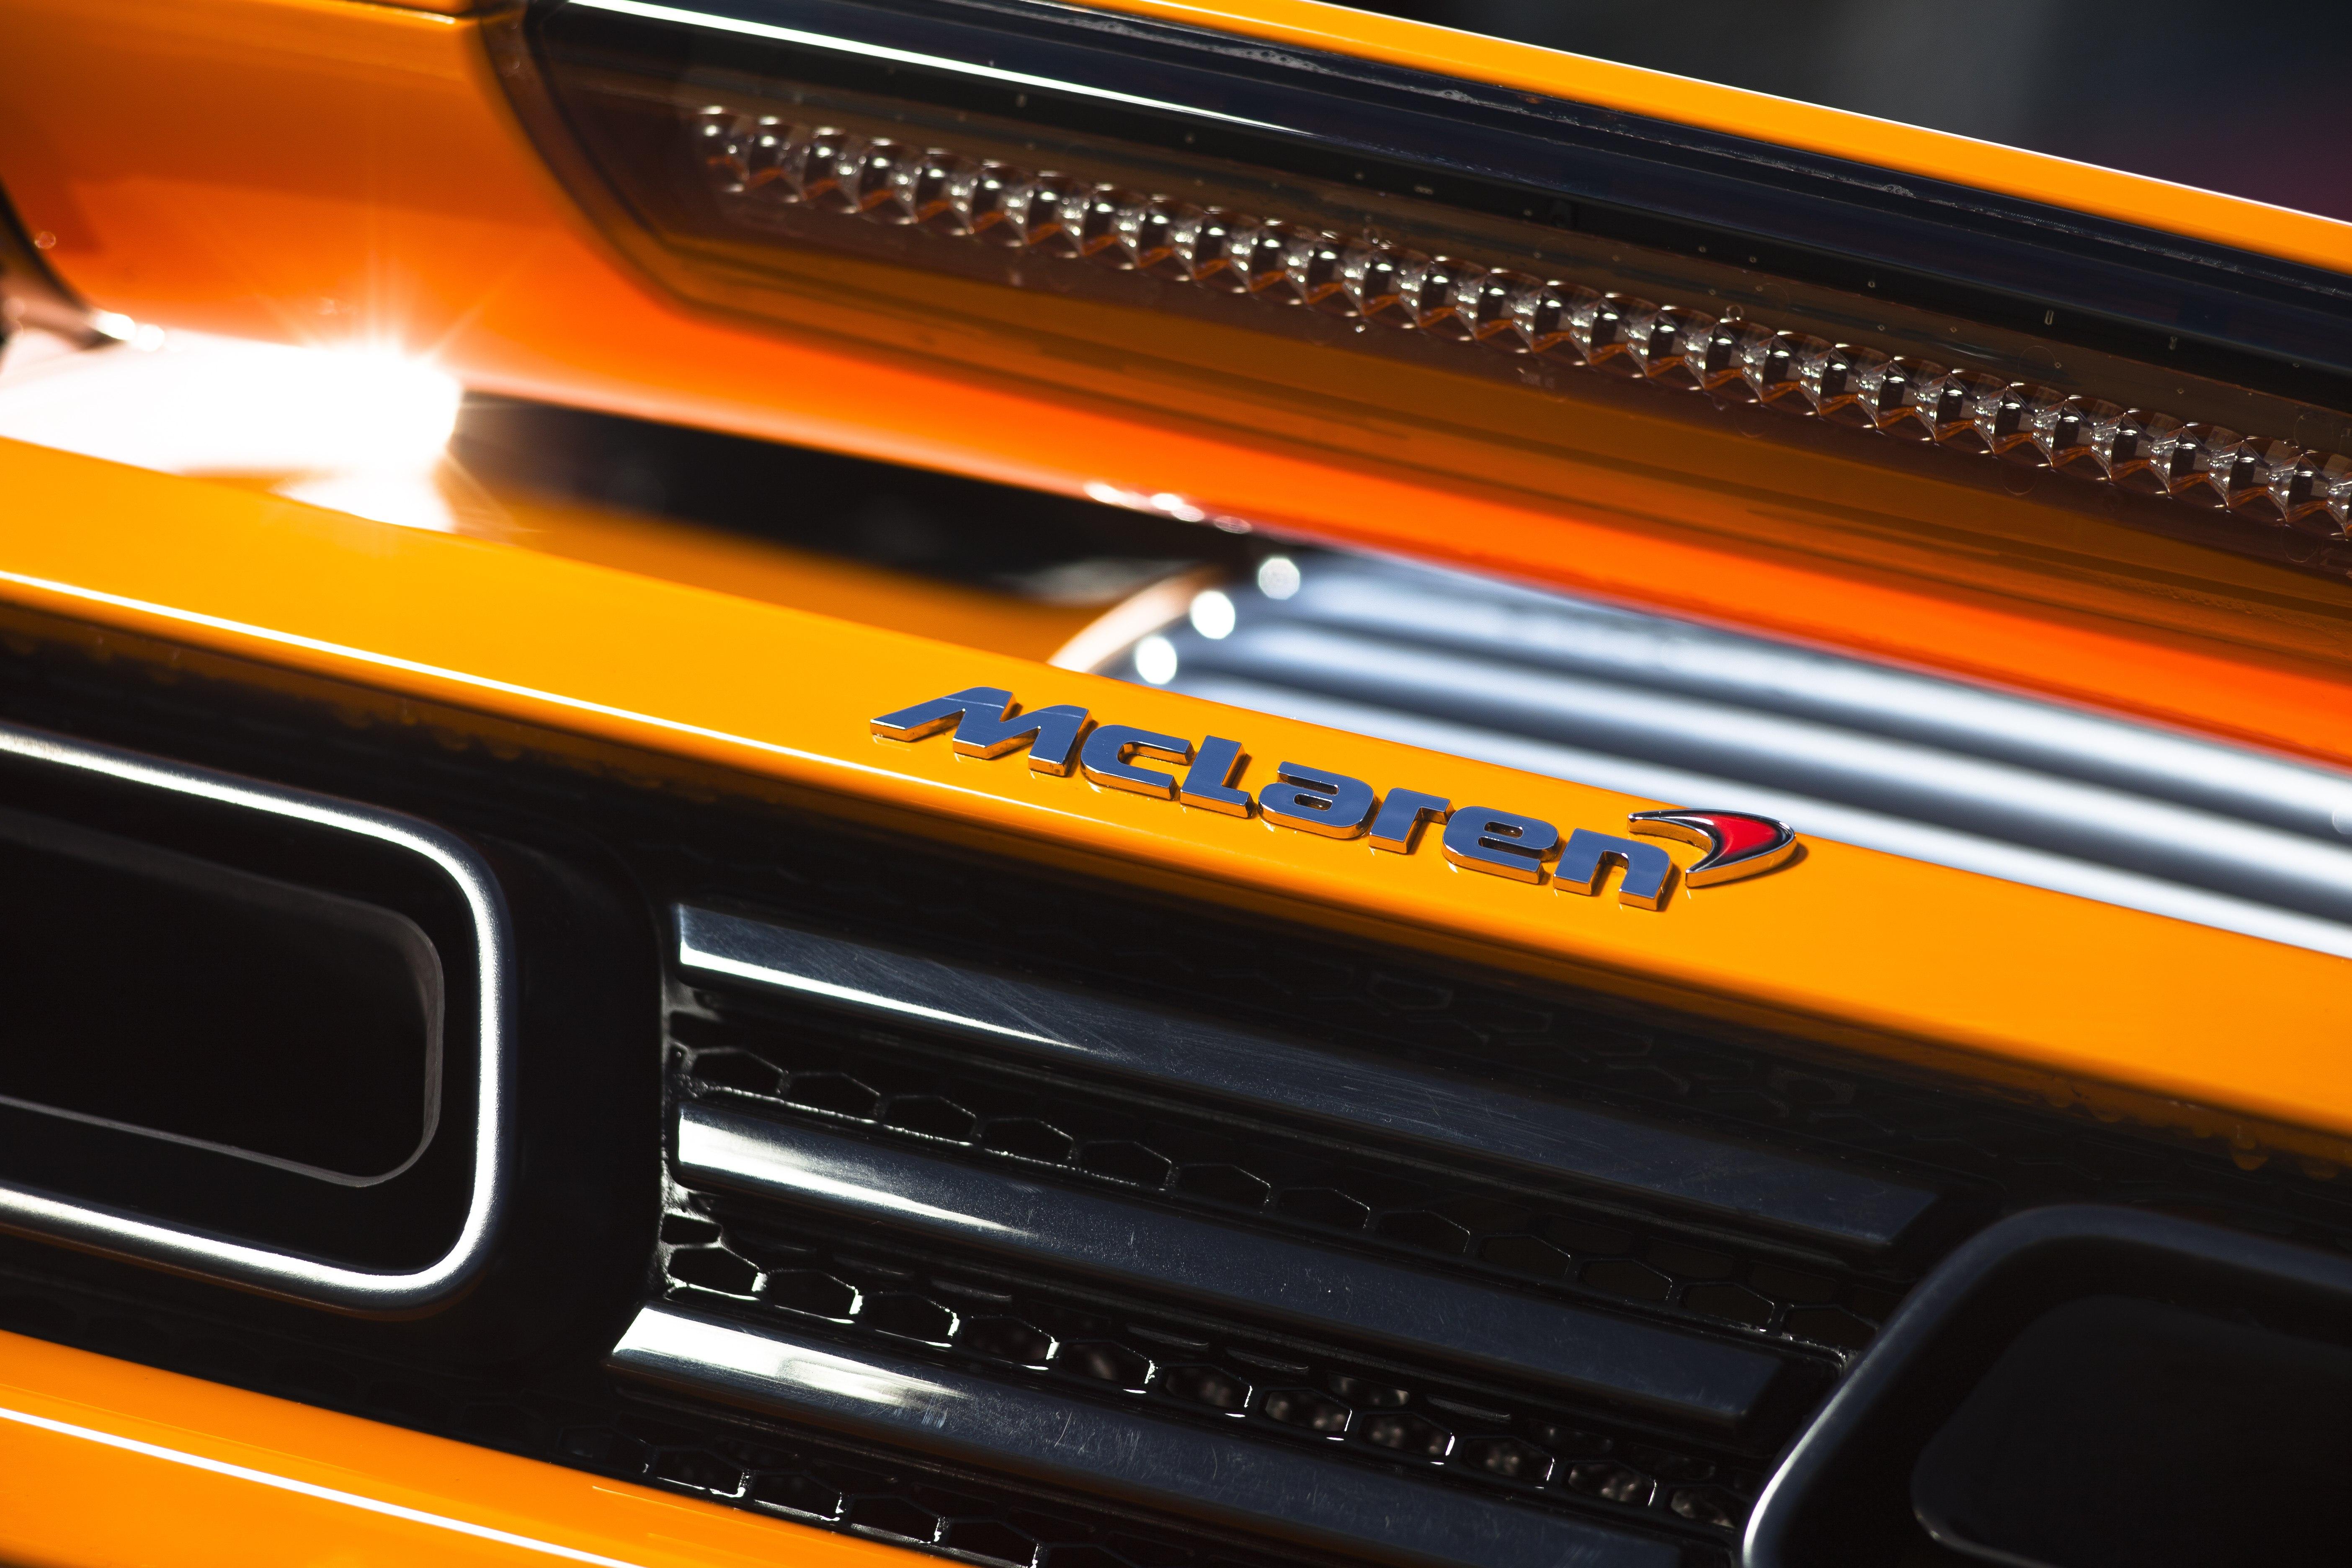 McLaren MP4-12C 2012 bright orange rear badge detail